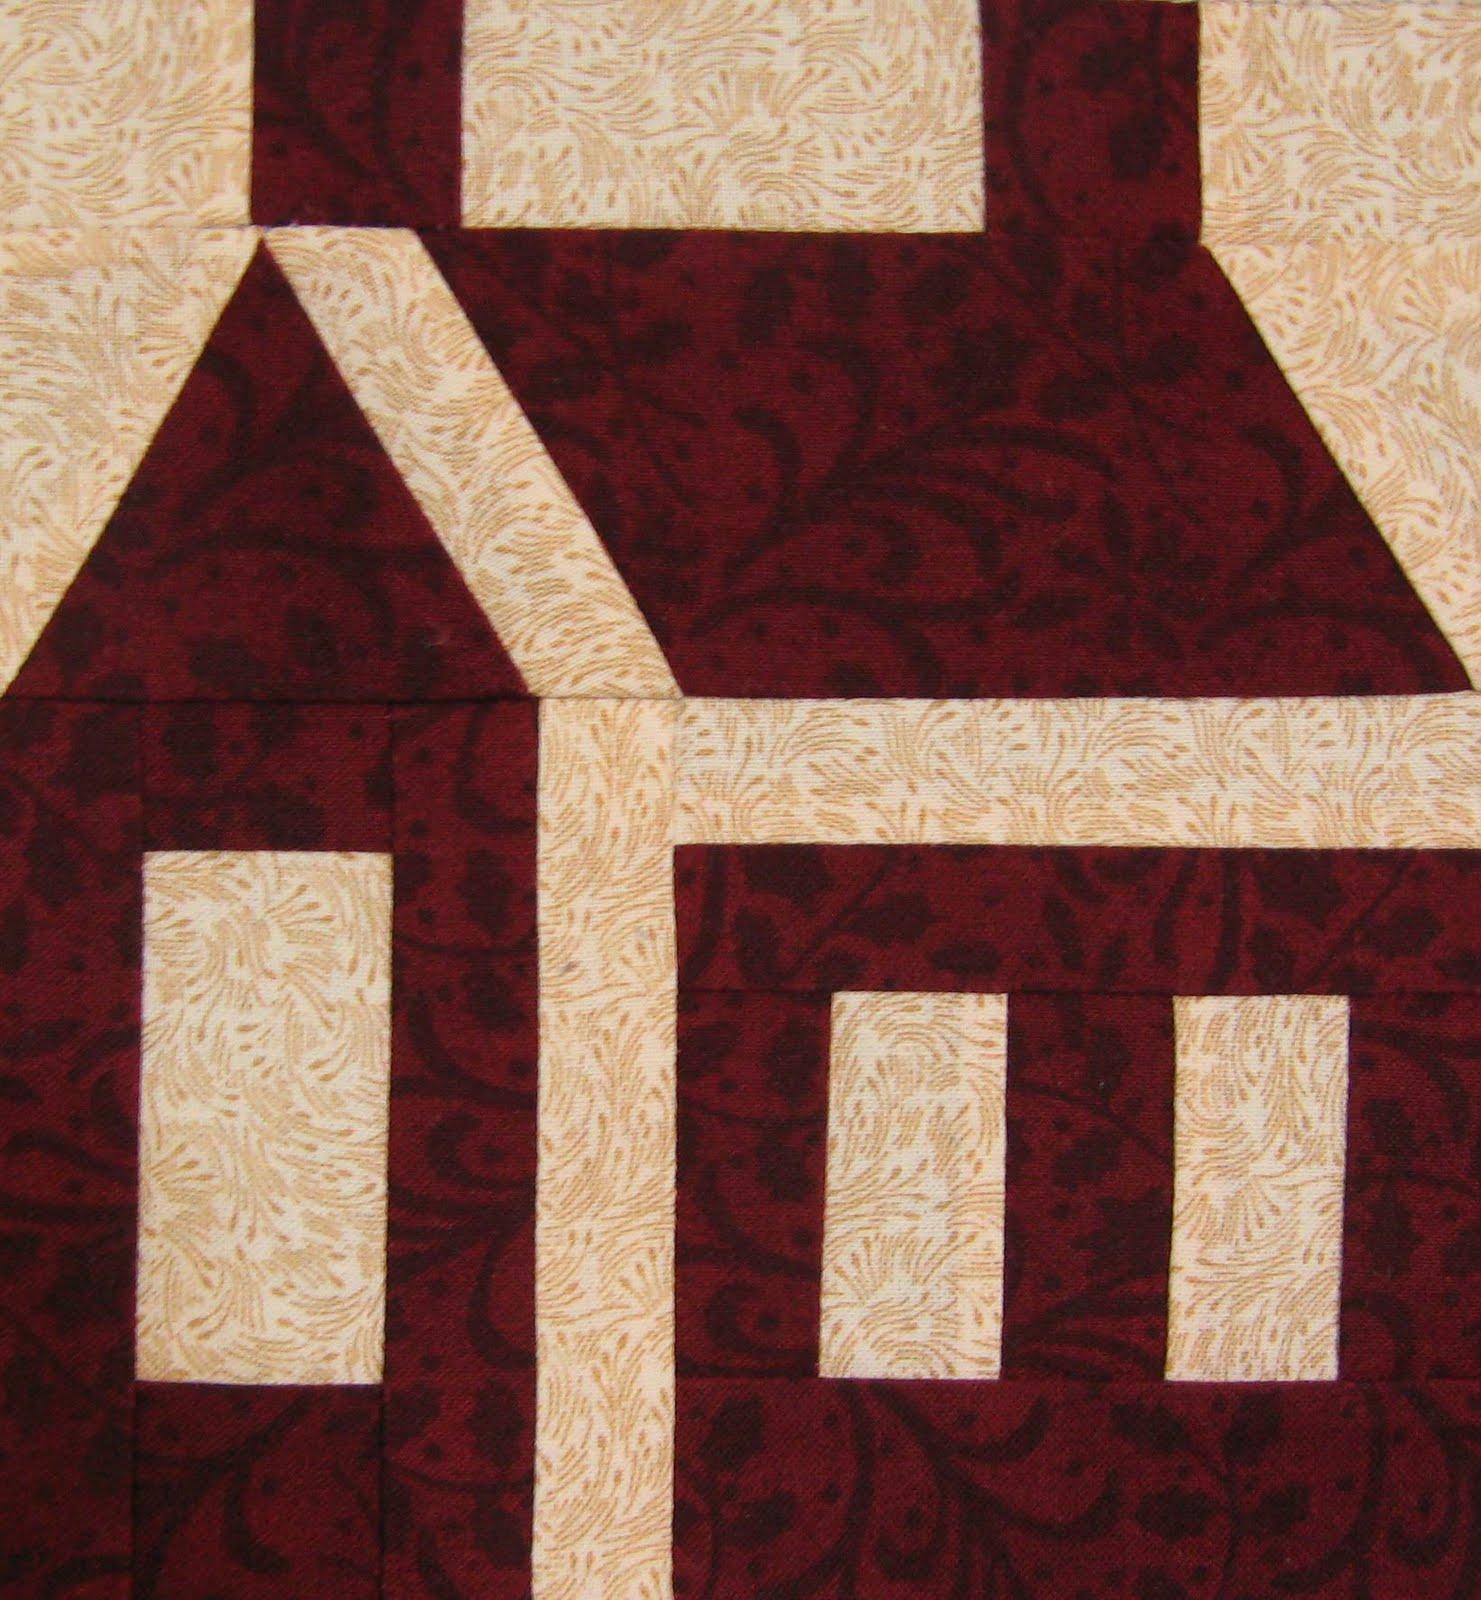 Paper Pieced Schoolhouse Quilt BlockPaper Pieced Schoolhouse Quilt Block How to get a man to ...